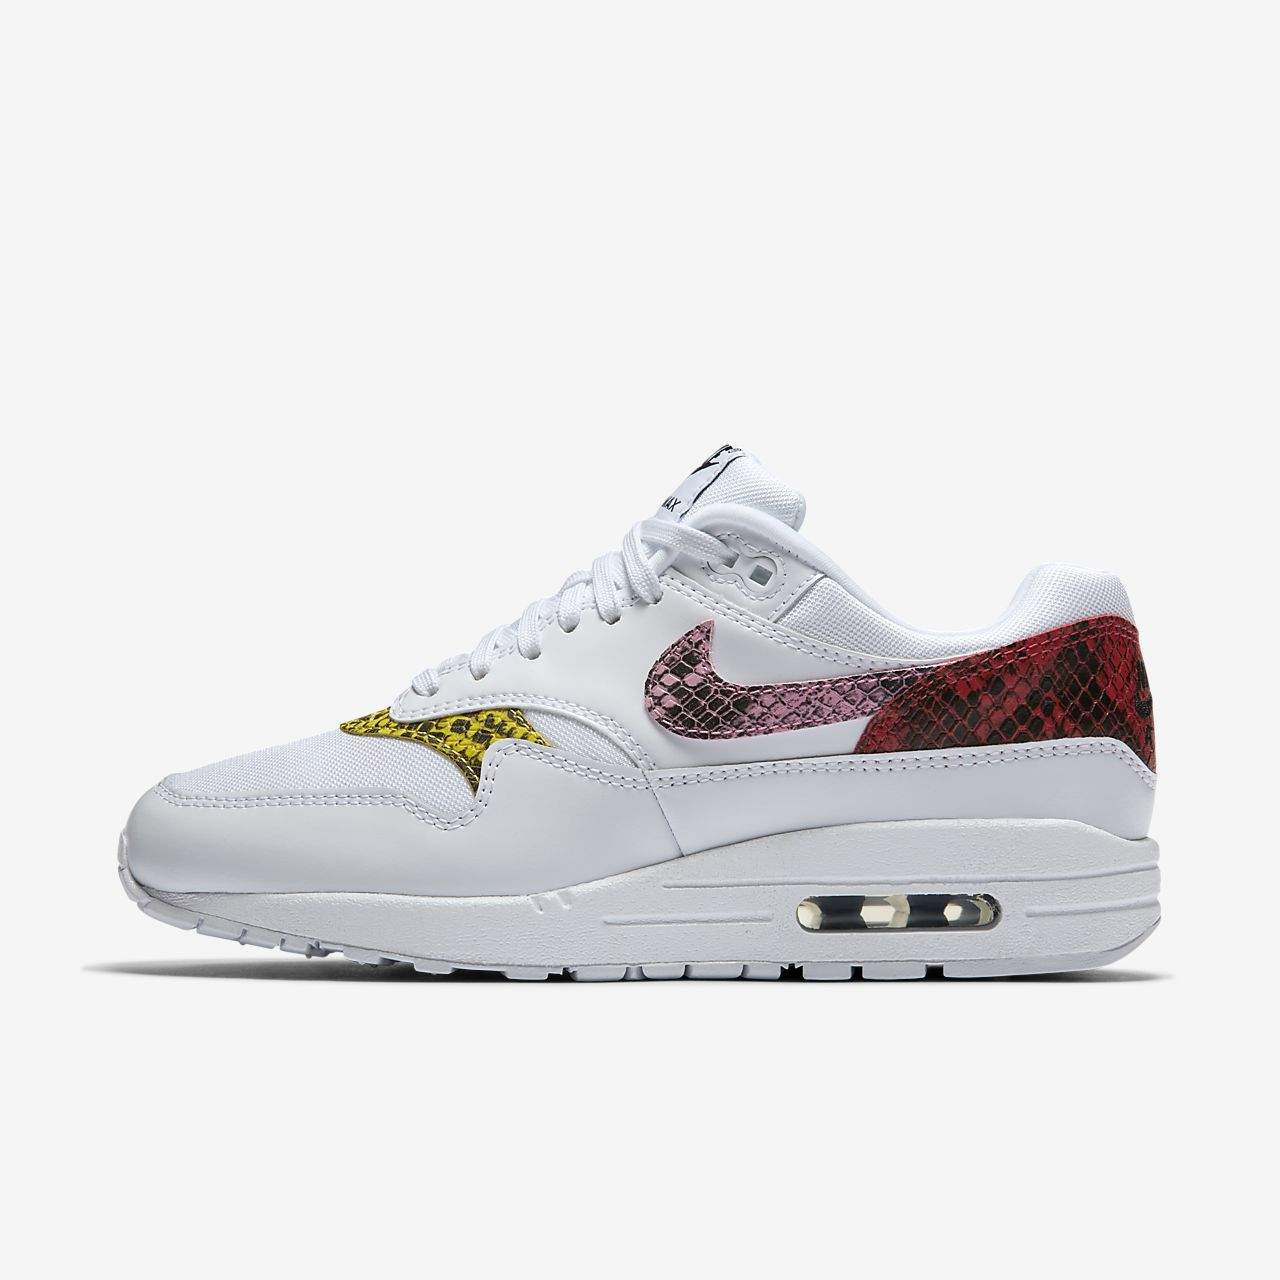 Animal Air Nike 1 Zapatillas MujerEs Premium Max rxeodCBW